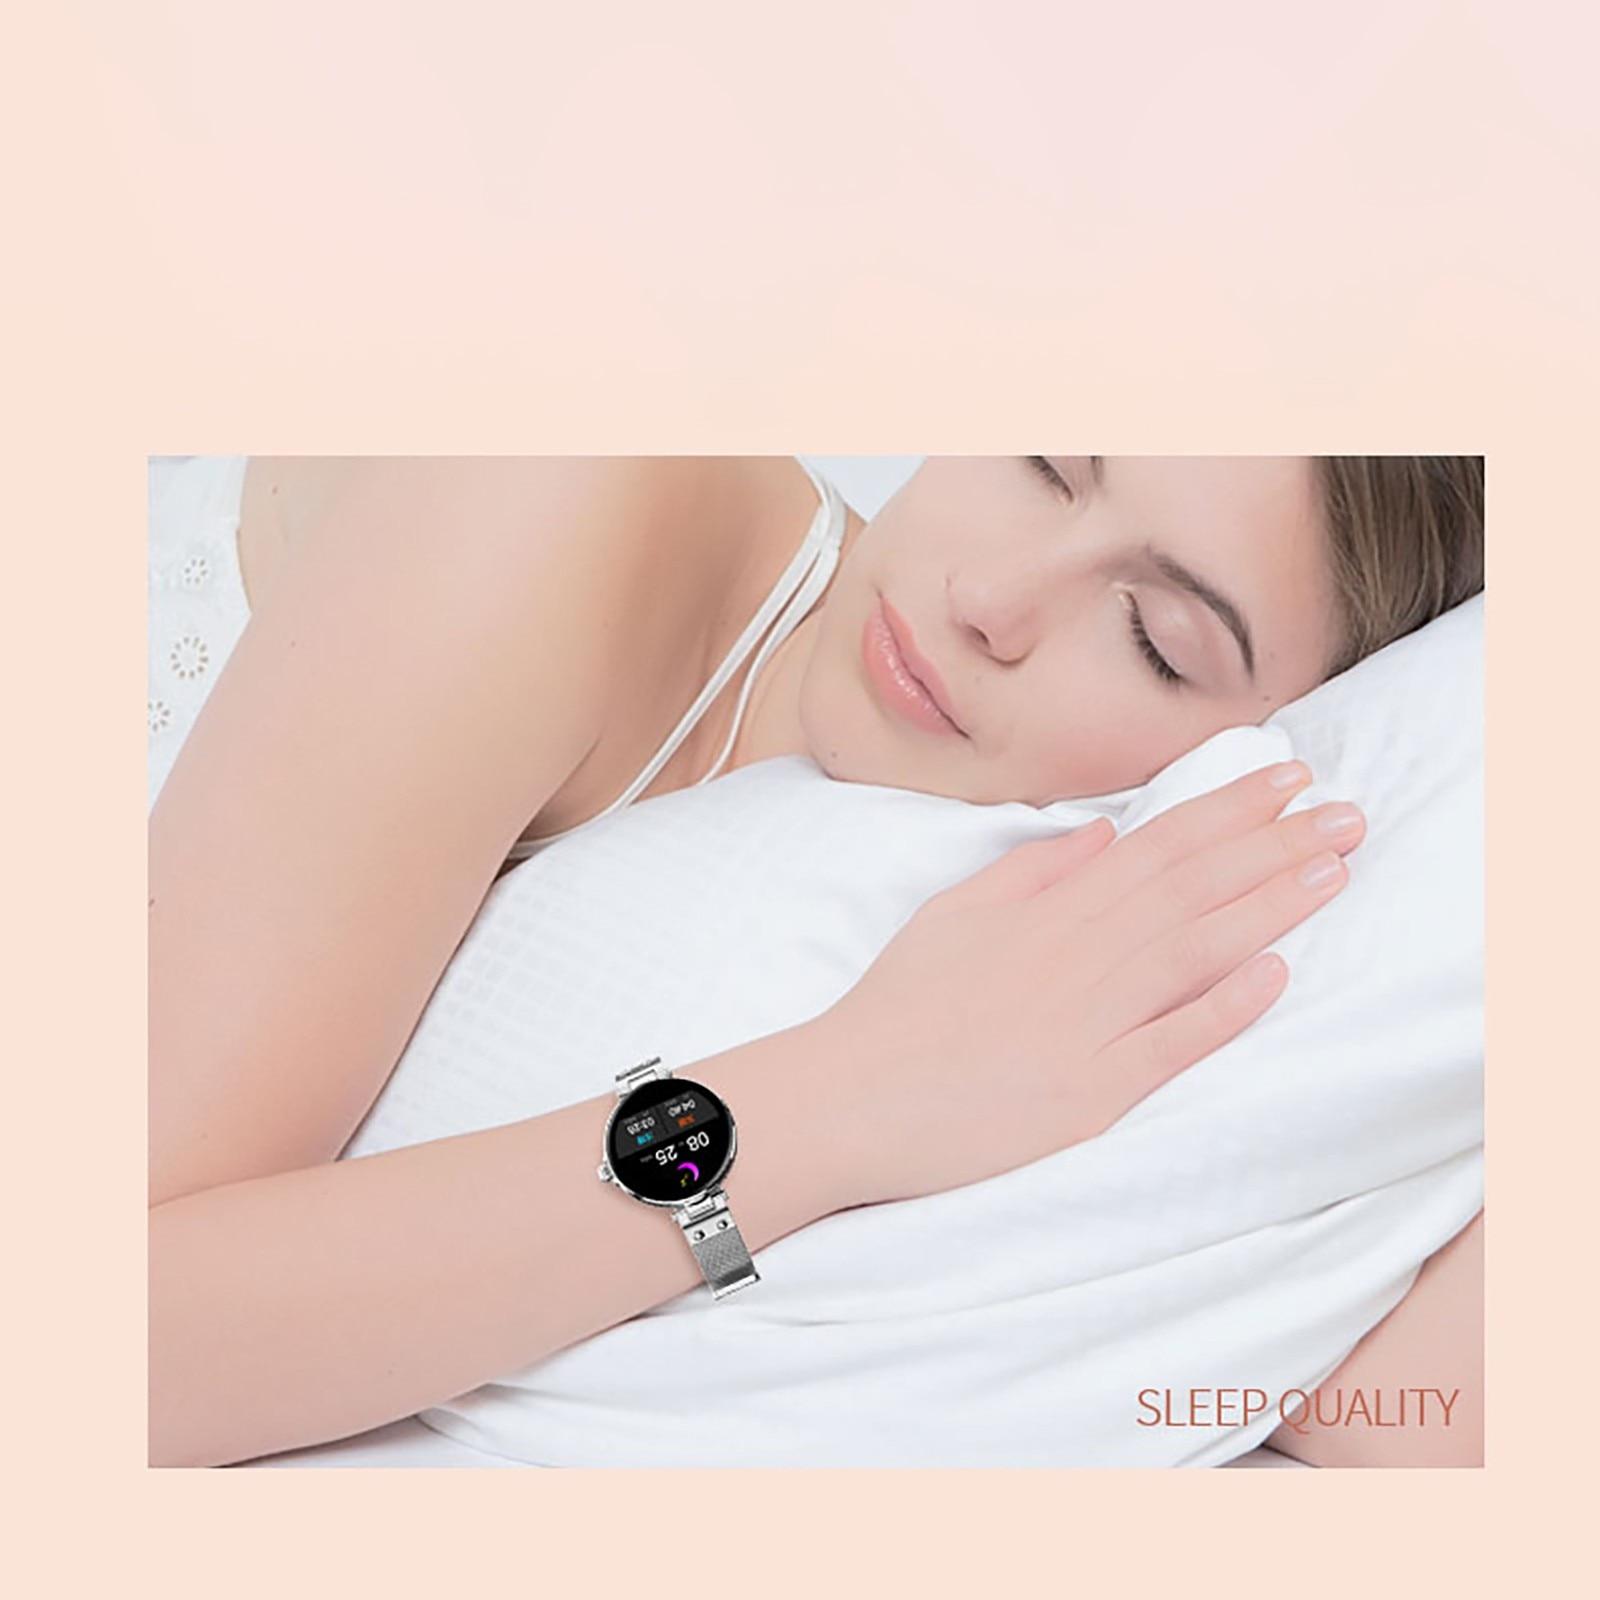 Nssd senhoras relógio inteligente temperatura do corpo